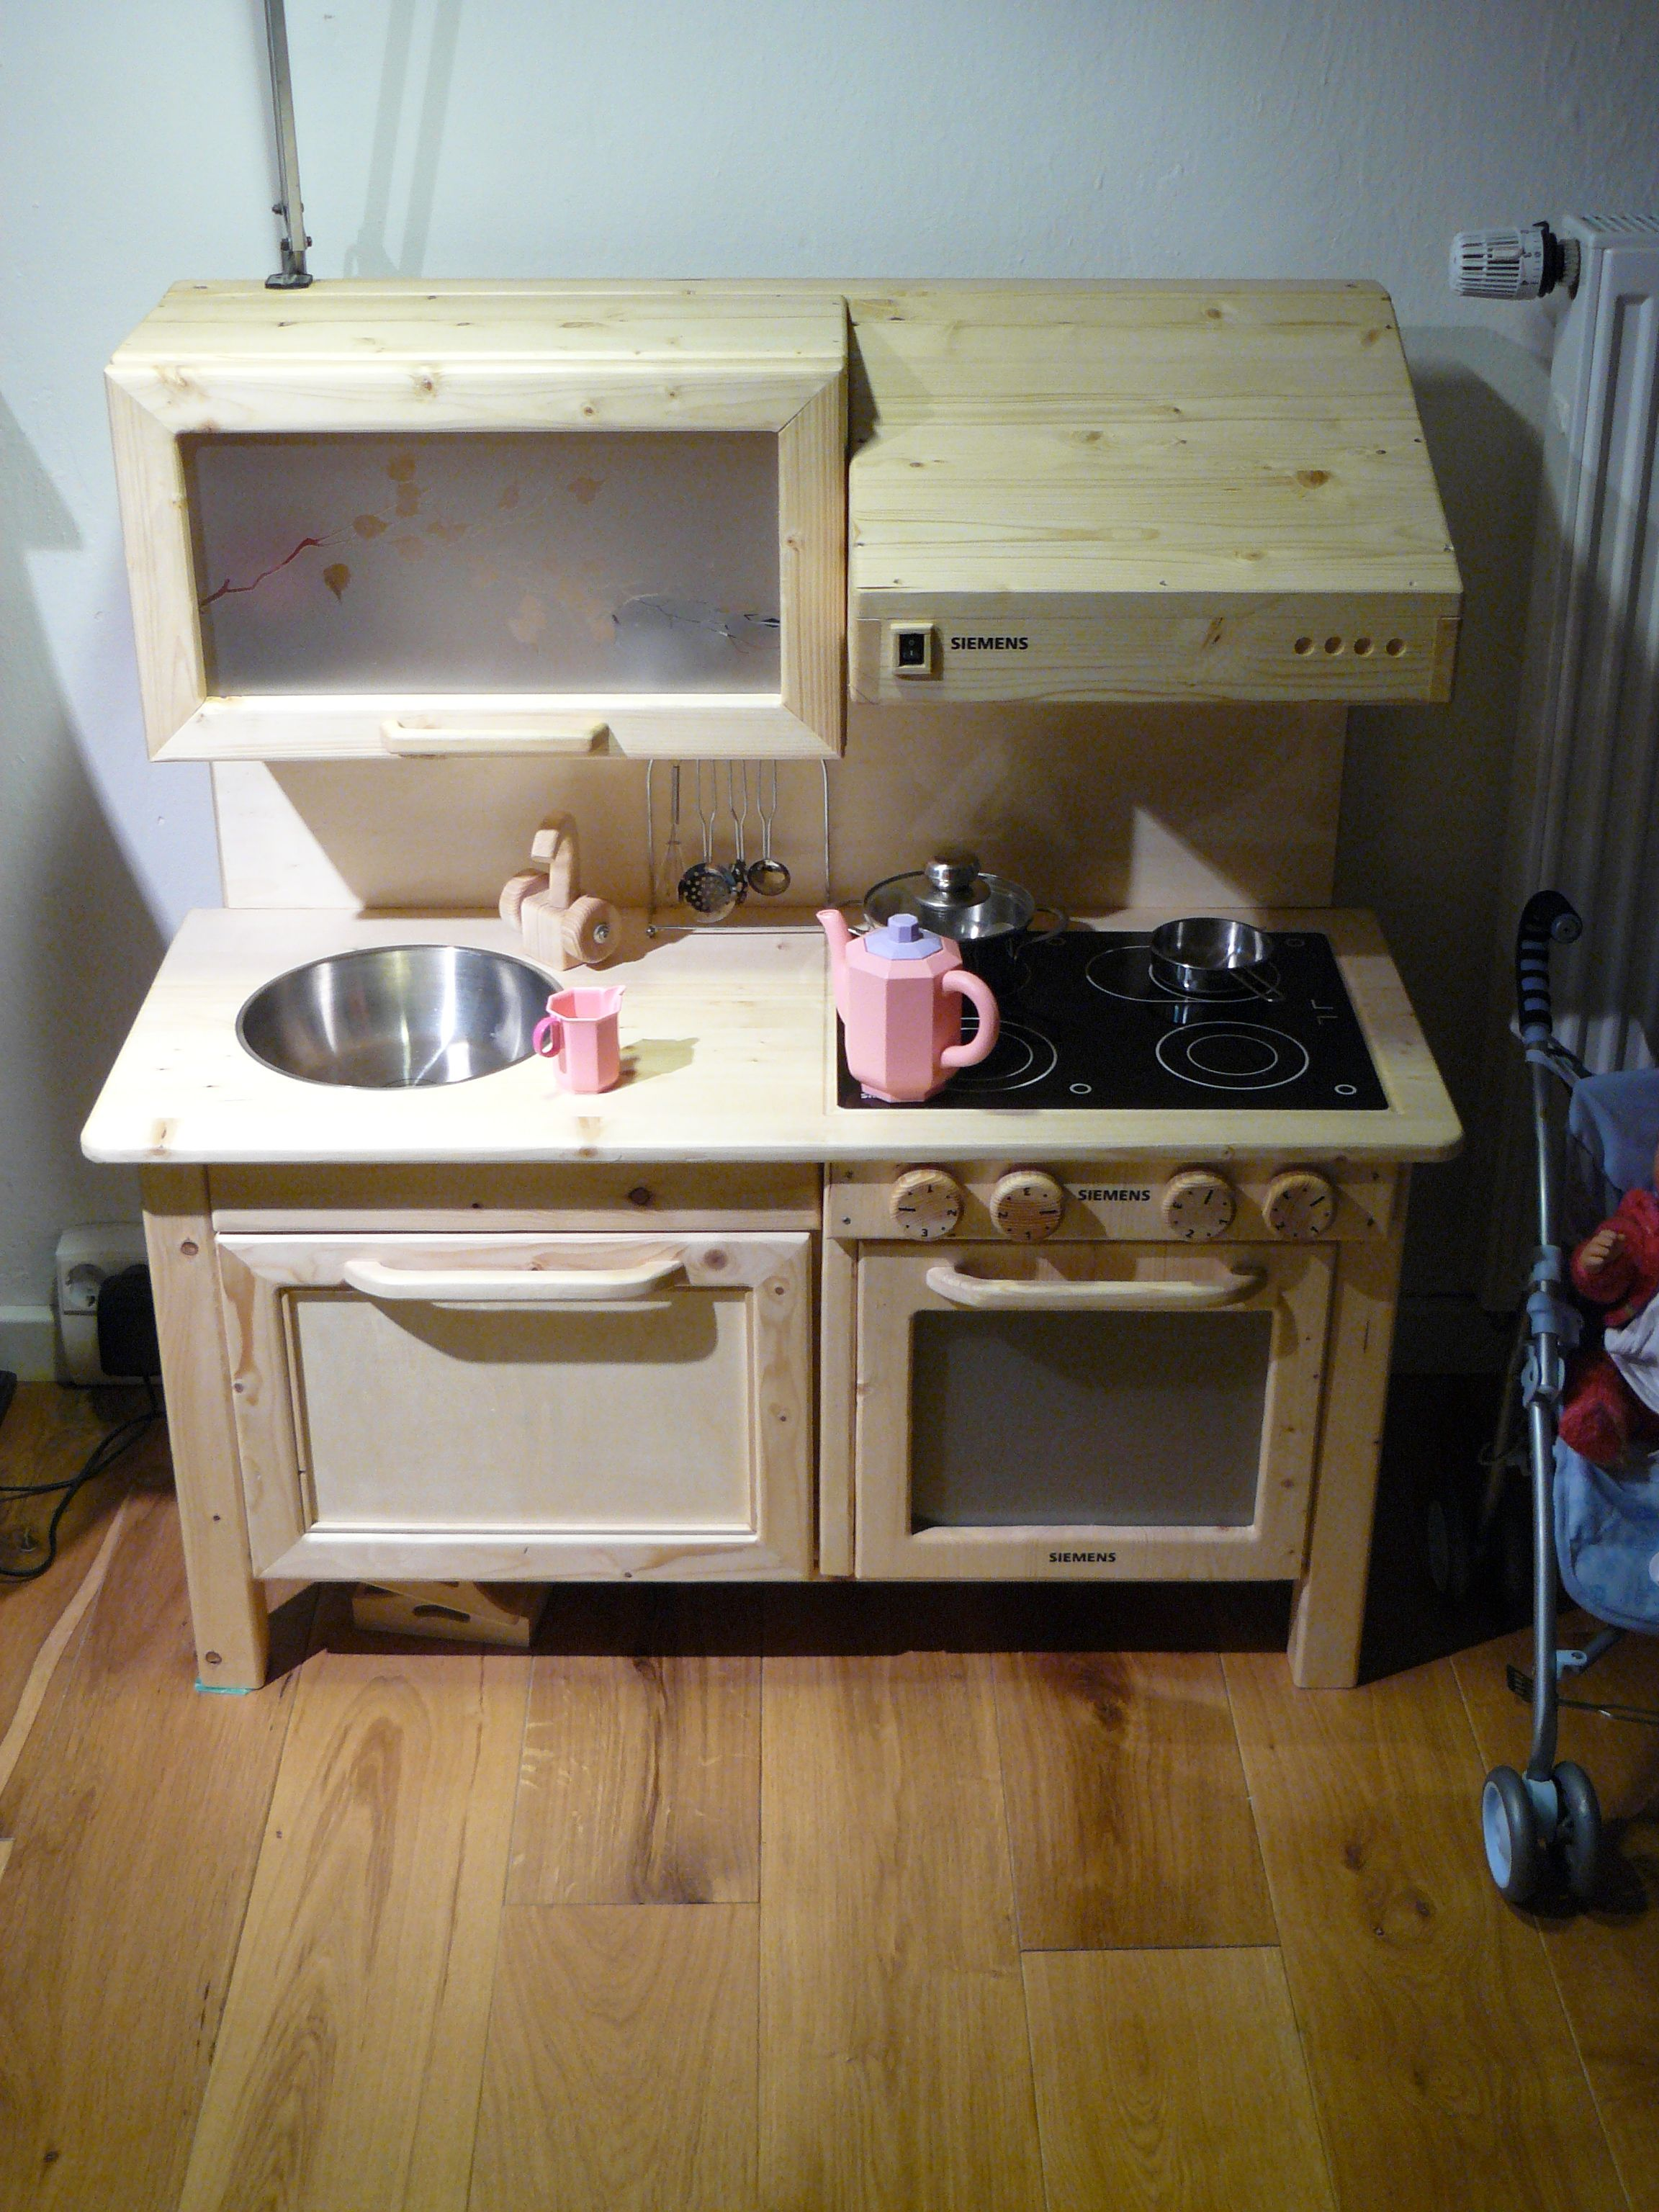 Selbstgebaute Kinderküche - Kiefer, Birkensperrholz, Acrylglas ...